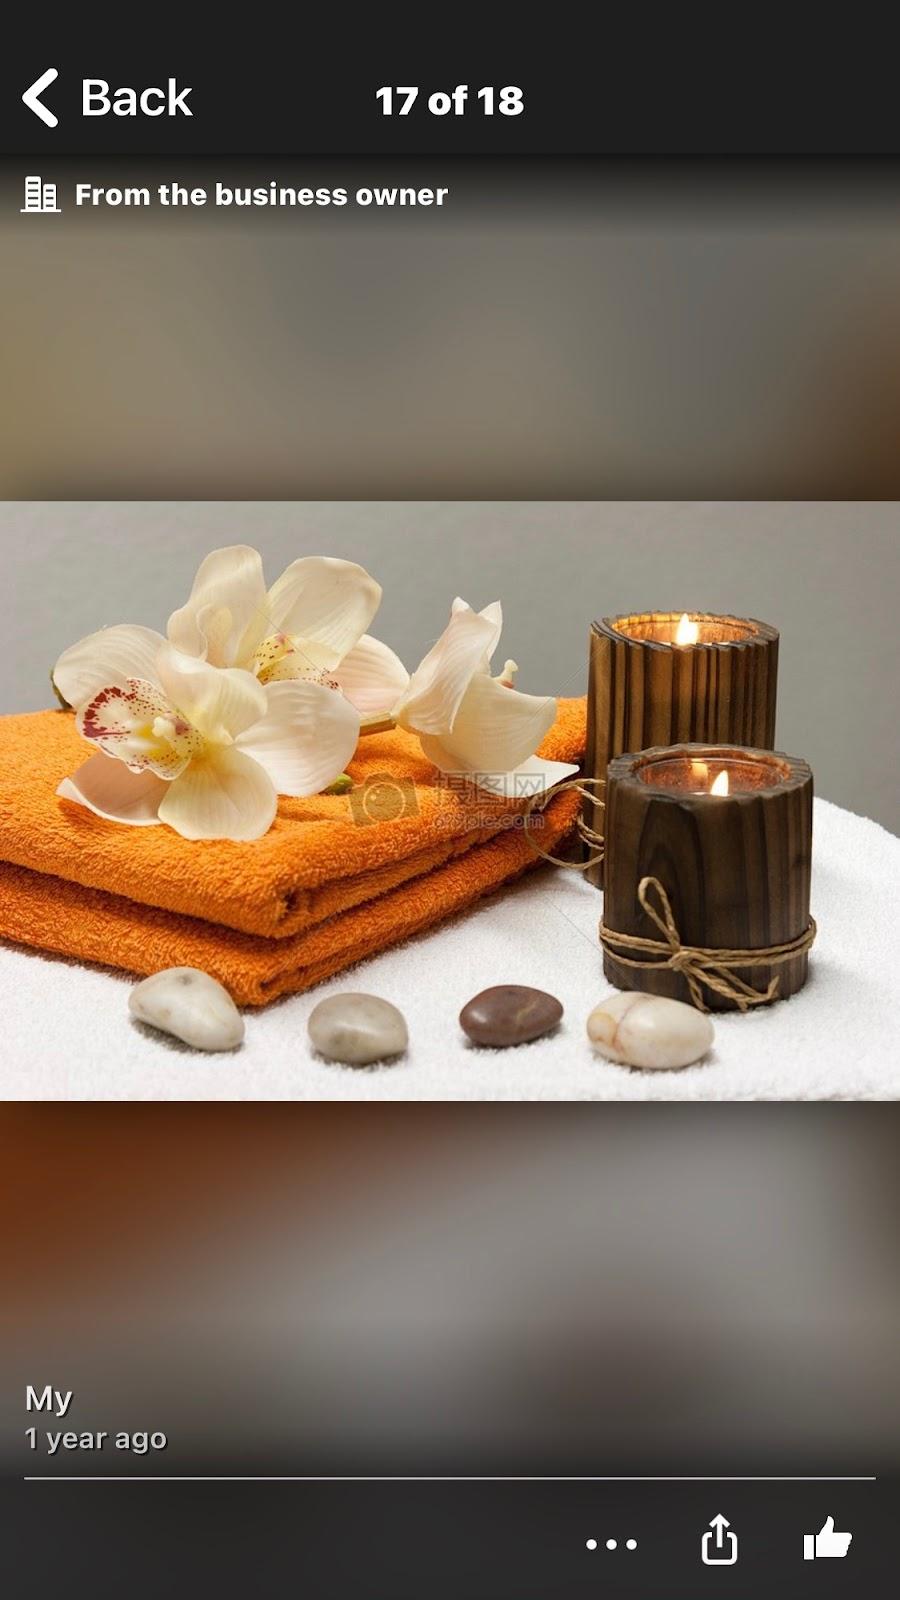 I-10 VIP massage - spa  | Photo 5 of 5 | Address: 12322 East Fwy, Houston, TX 77015, USA | Phone: (832) 623-3840